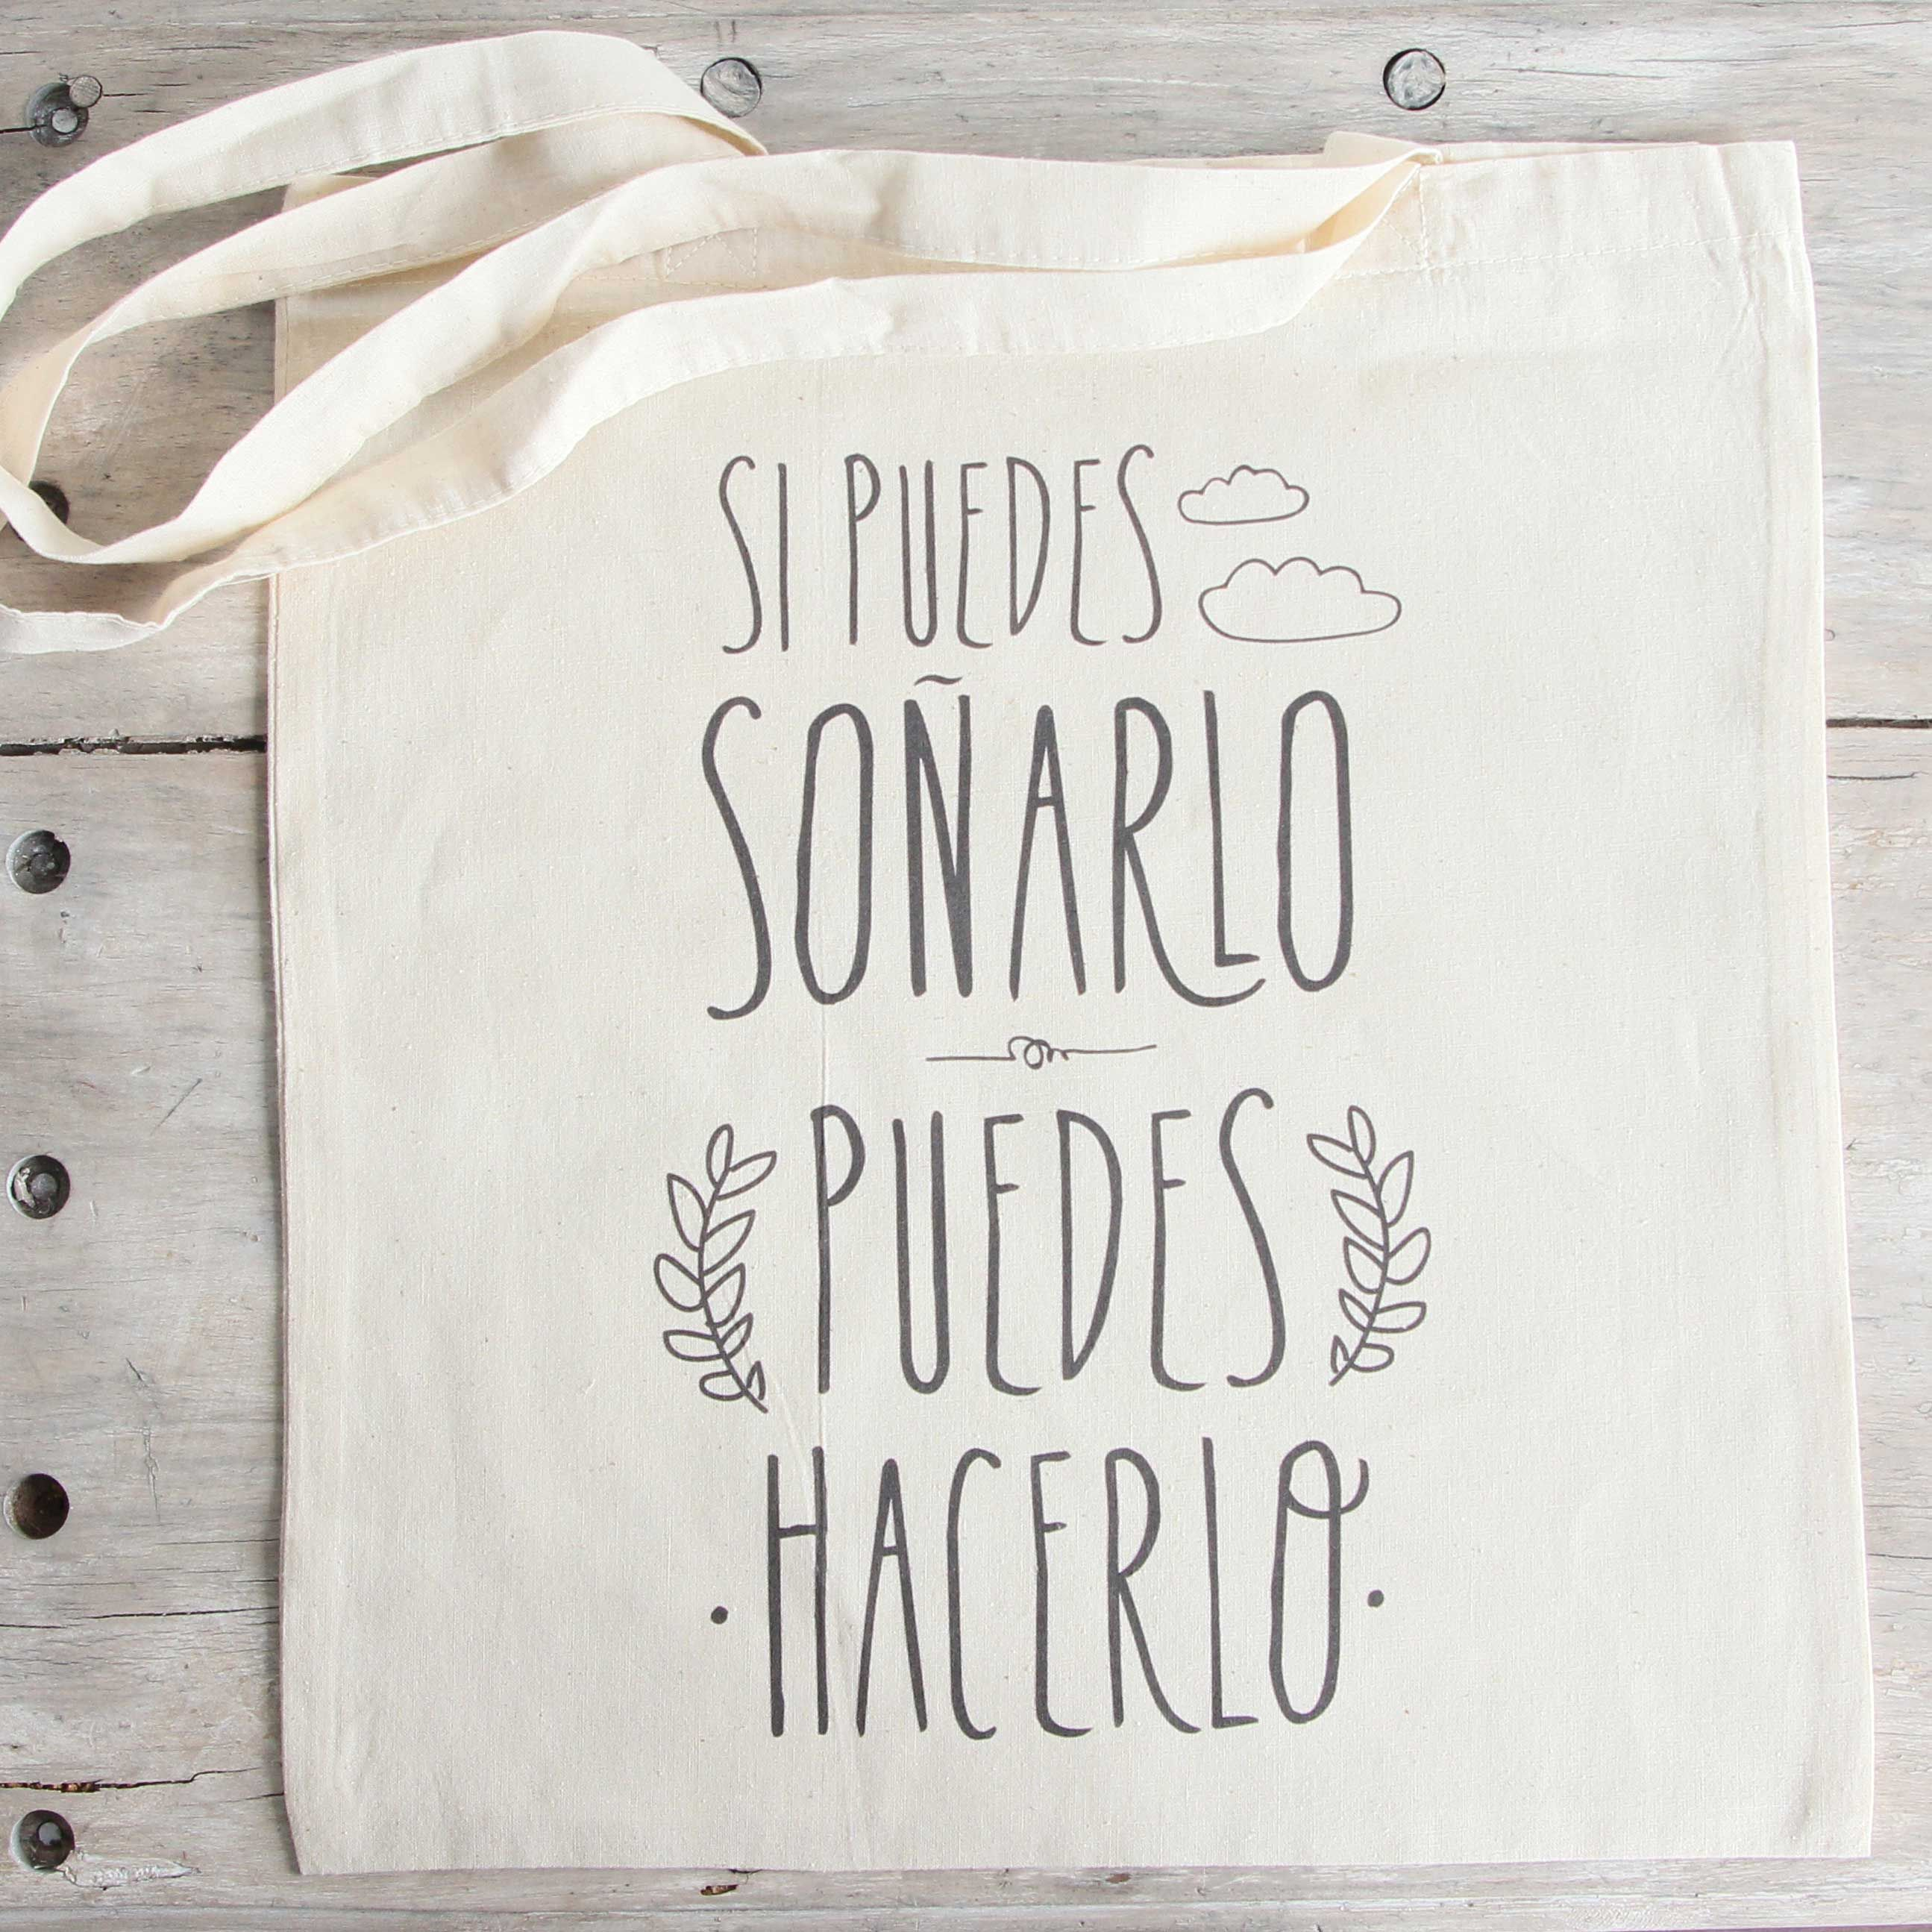 Mr wonderful bag mr wonderful pinterest si puedo - Pegatinas pared frases ...